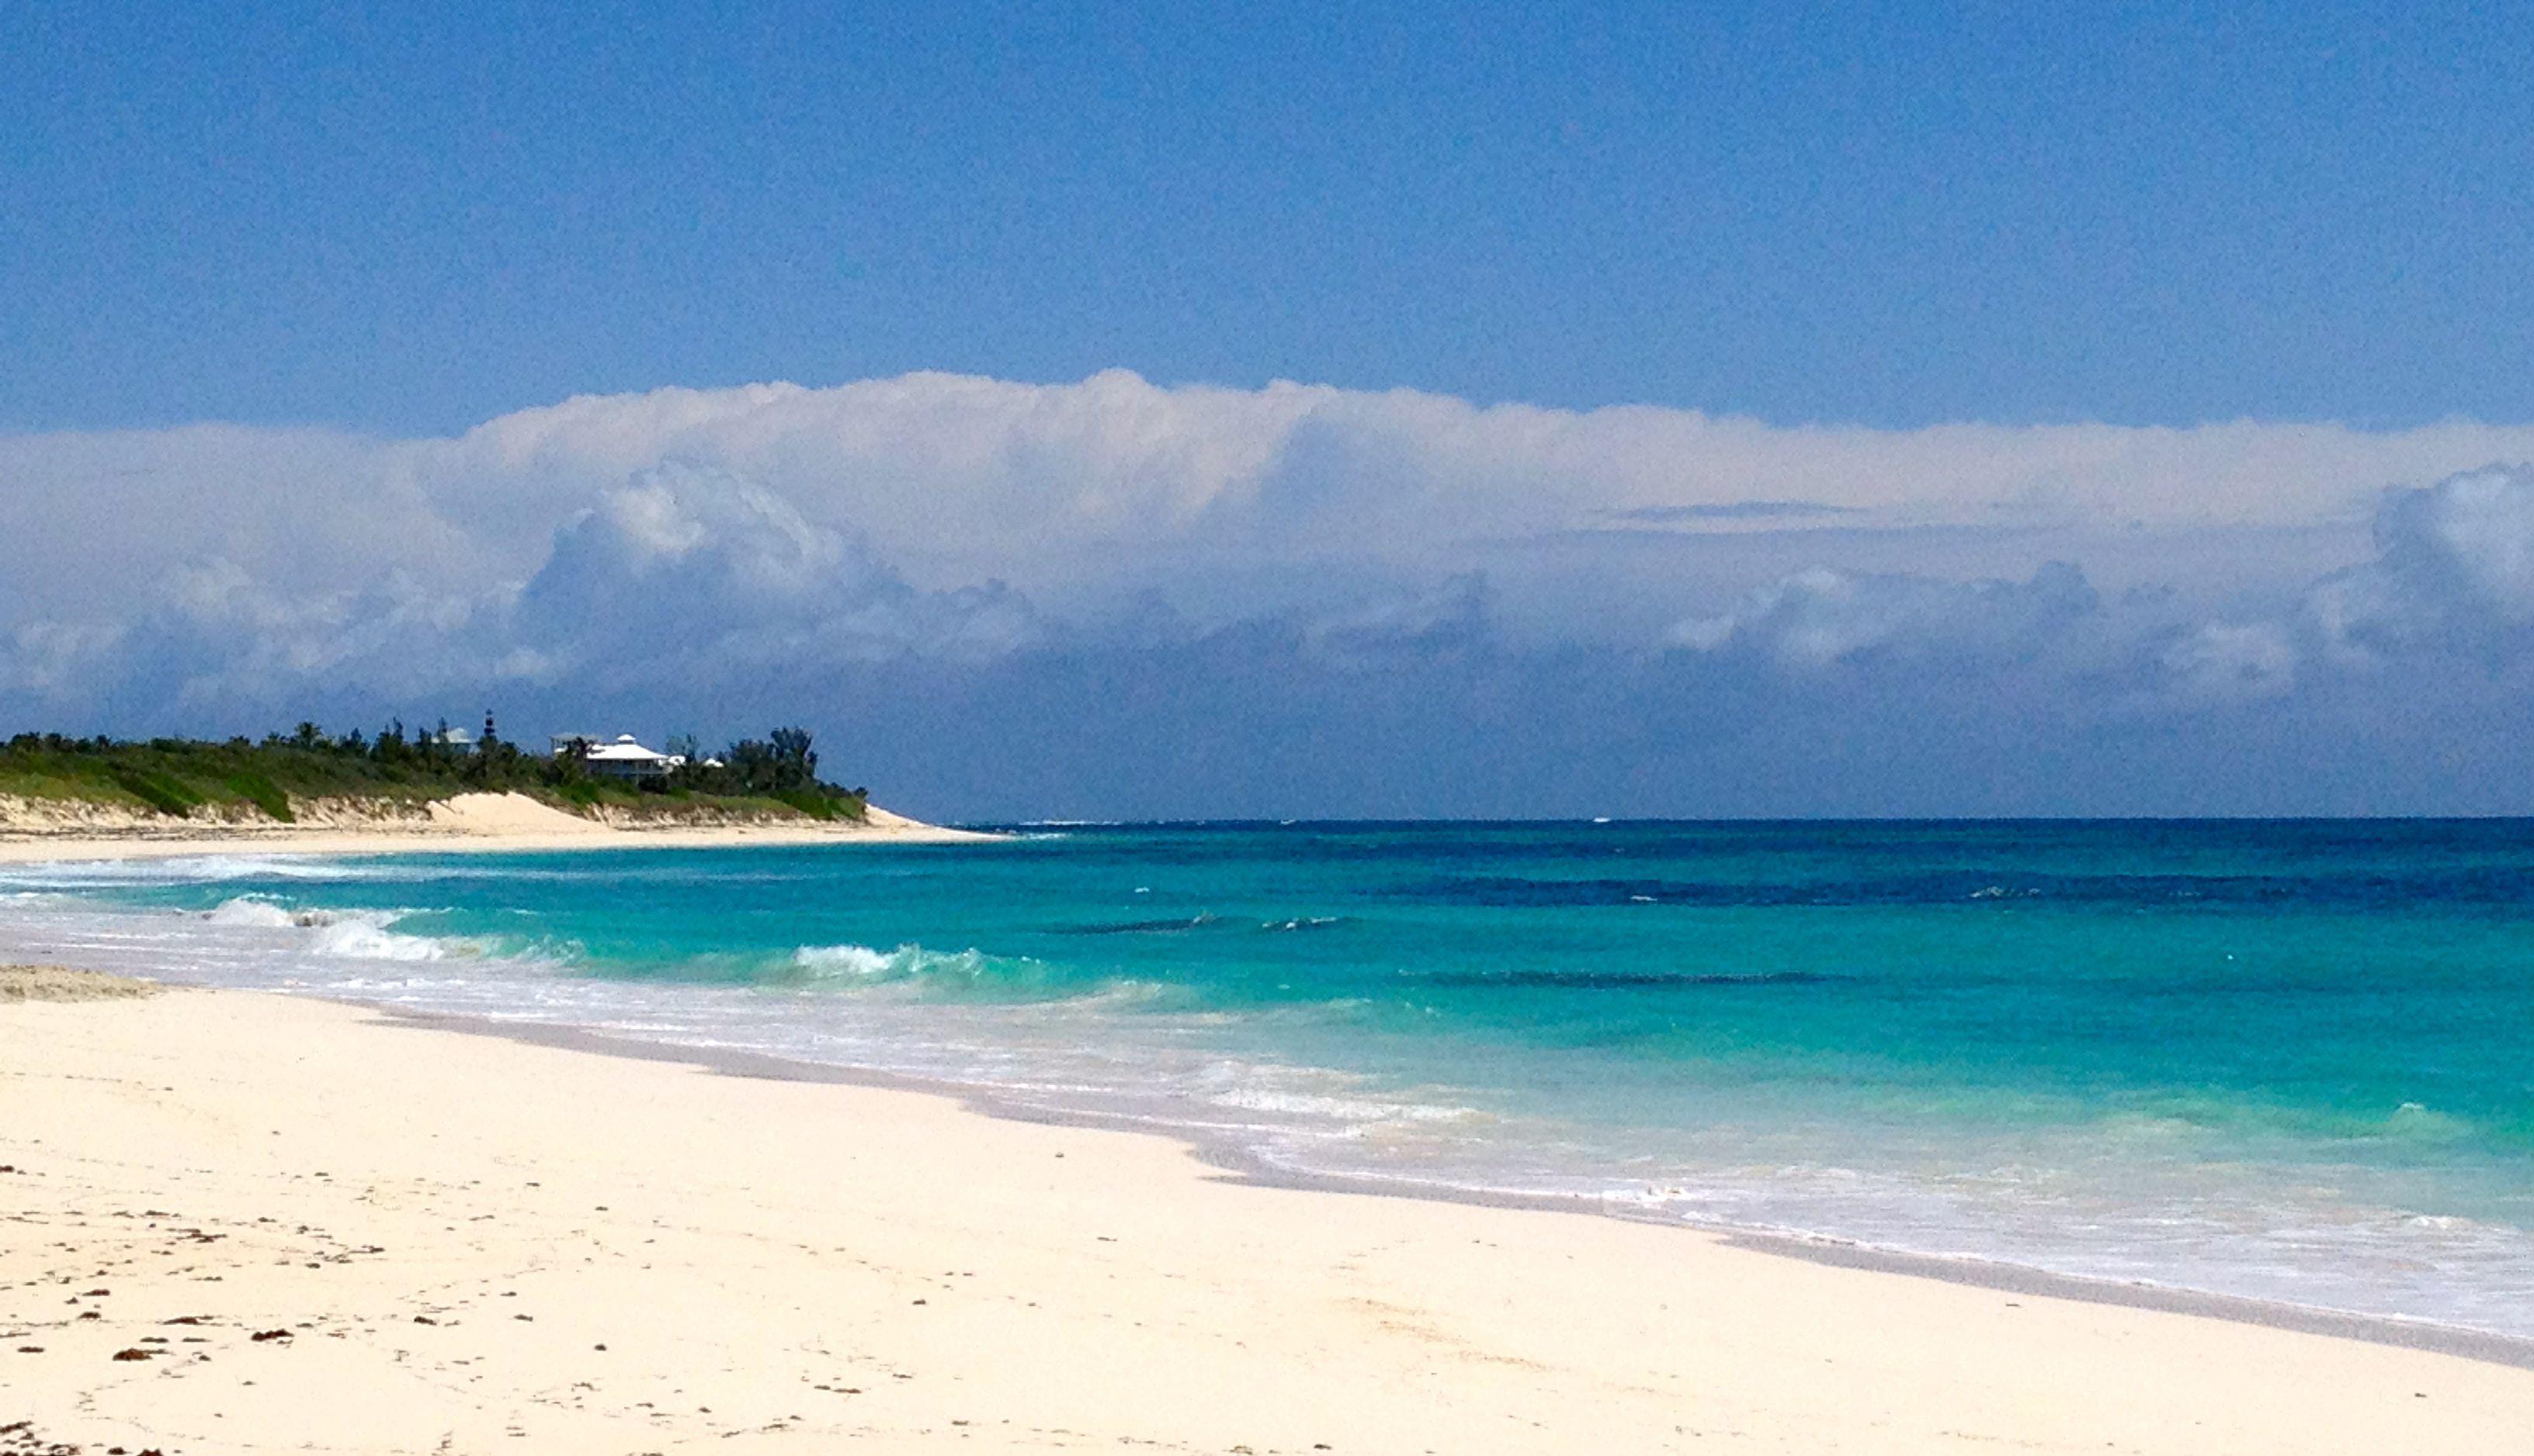 Beach behind methodist church in hope town elbow cay bahamas